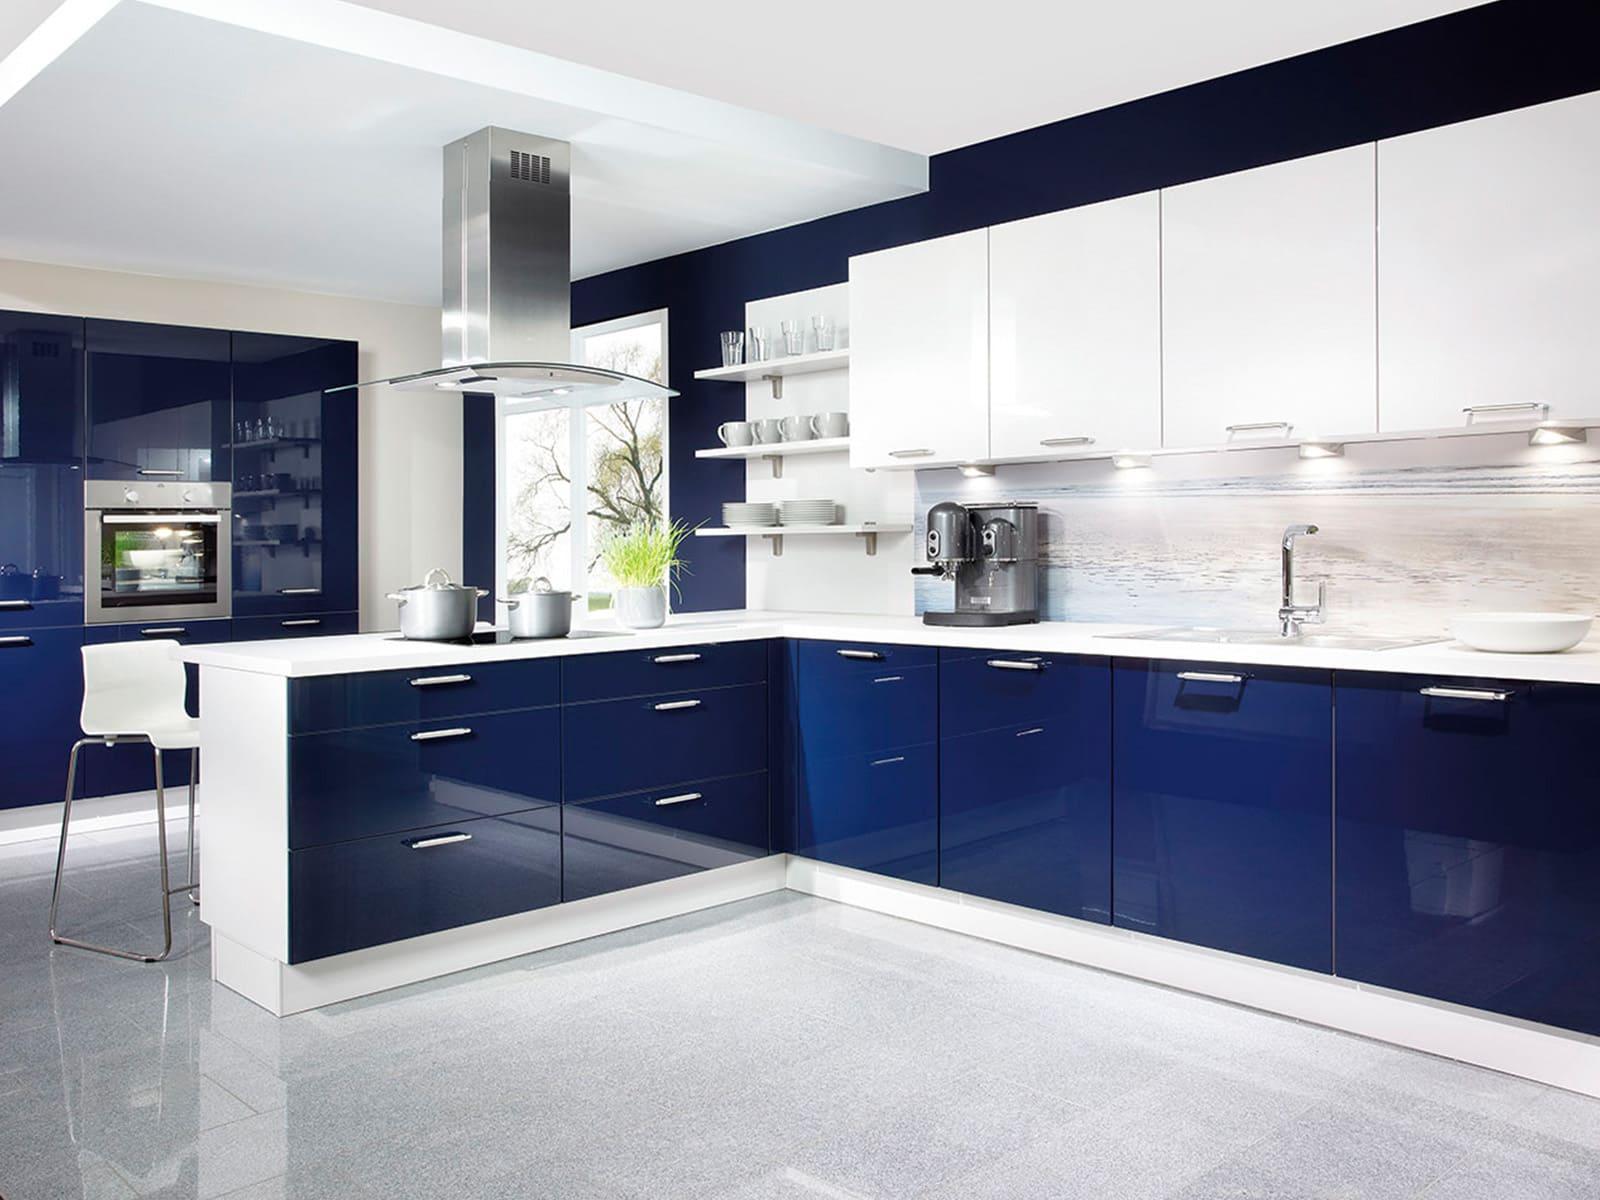 Кухня в стиле модерн (стили кухни в интерьере)